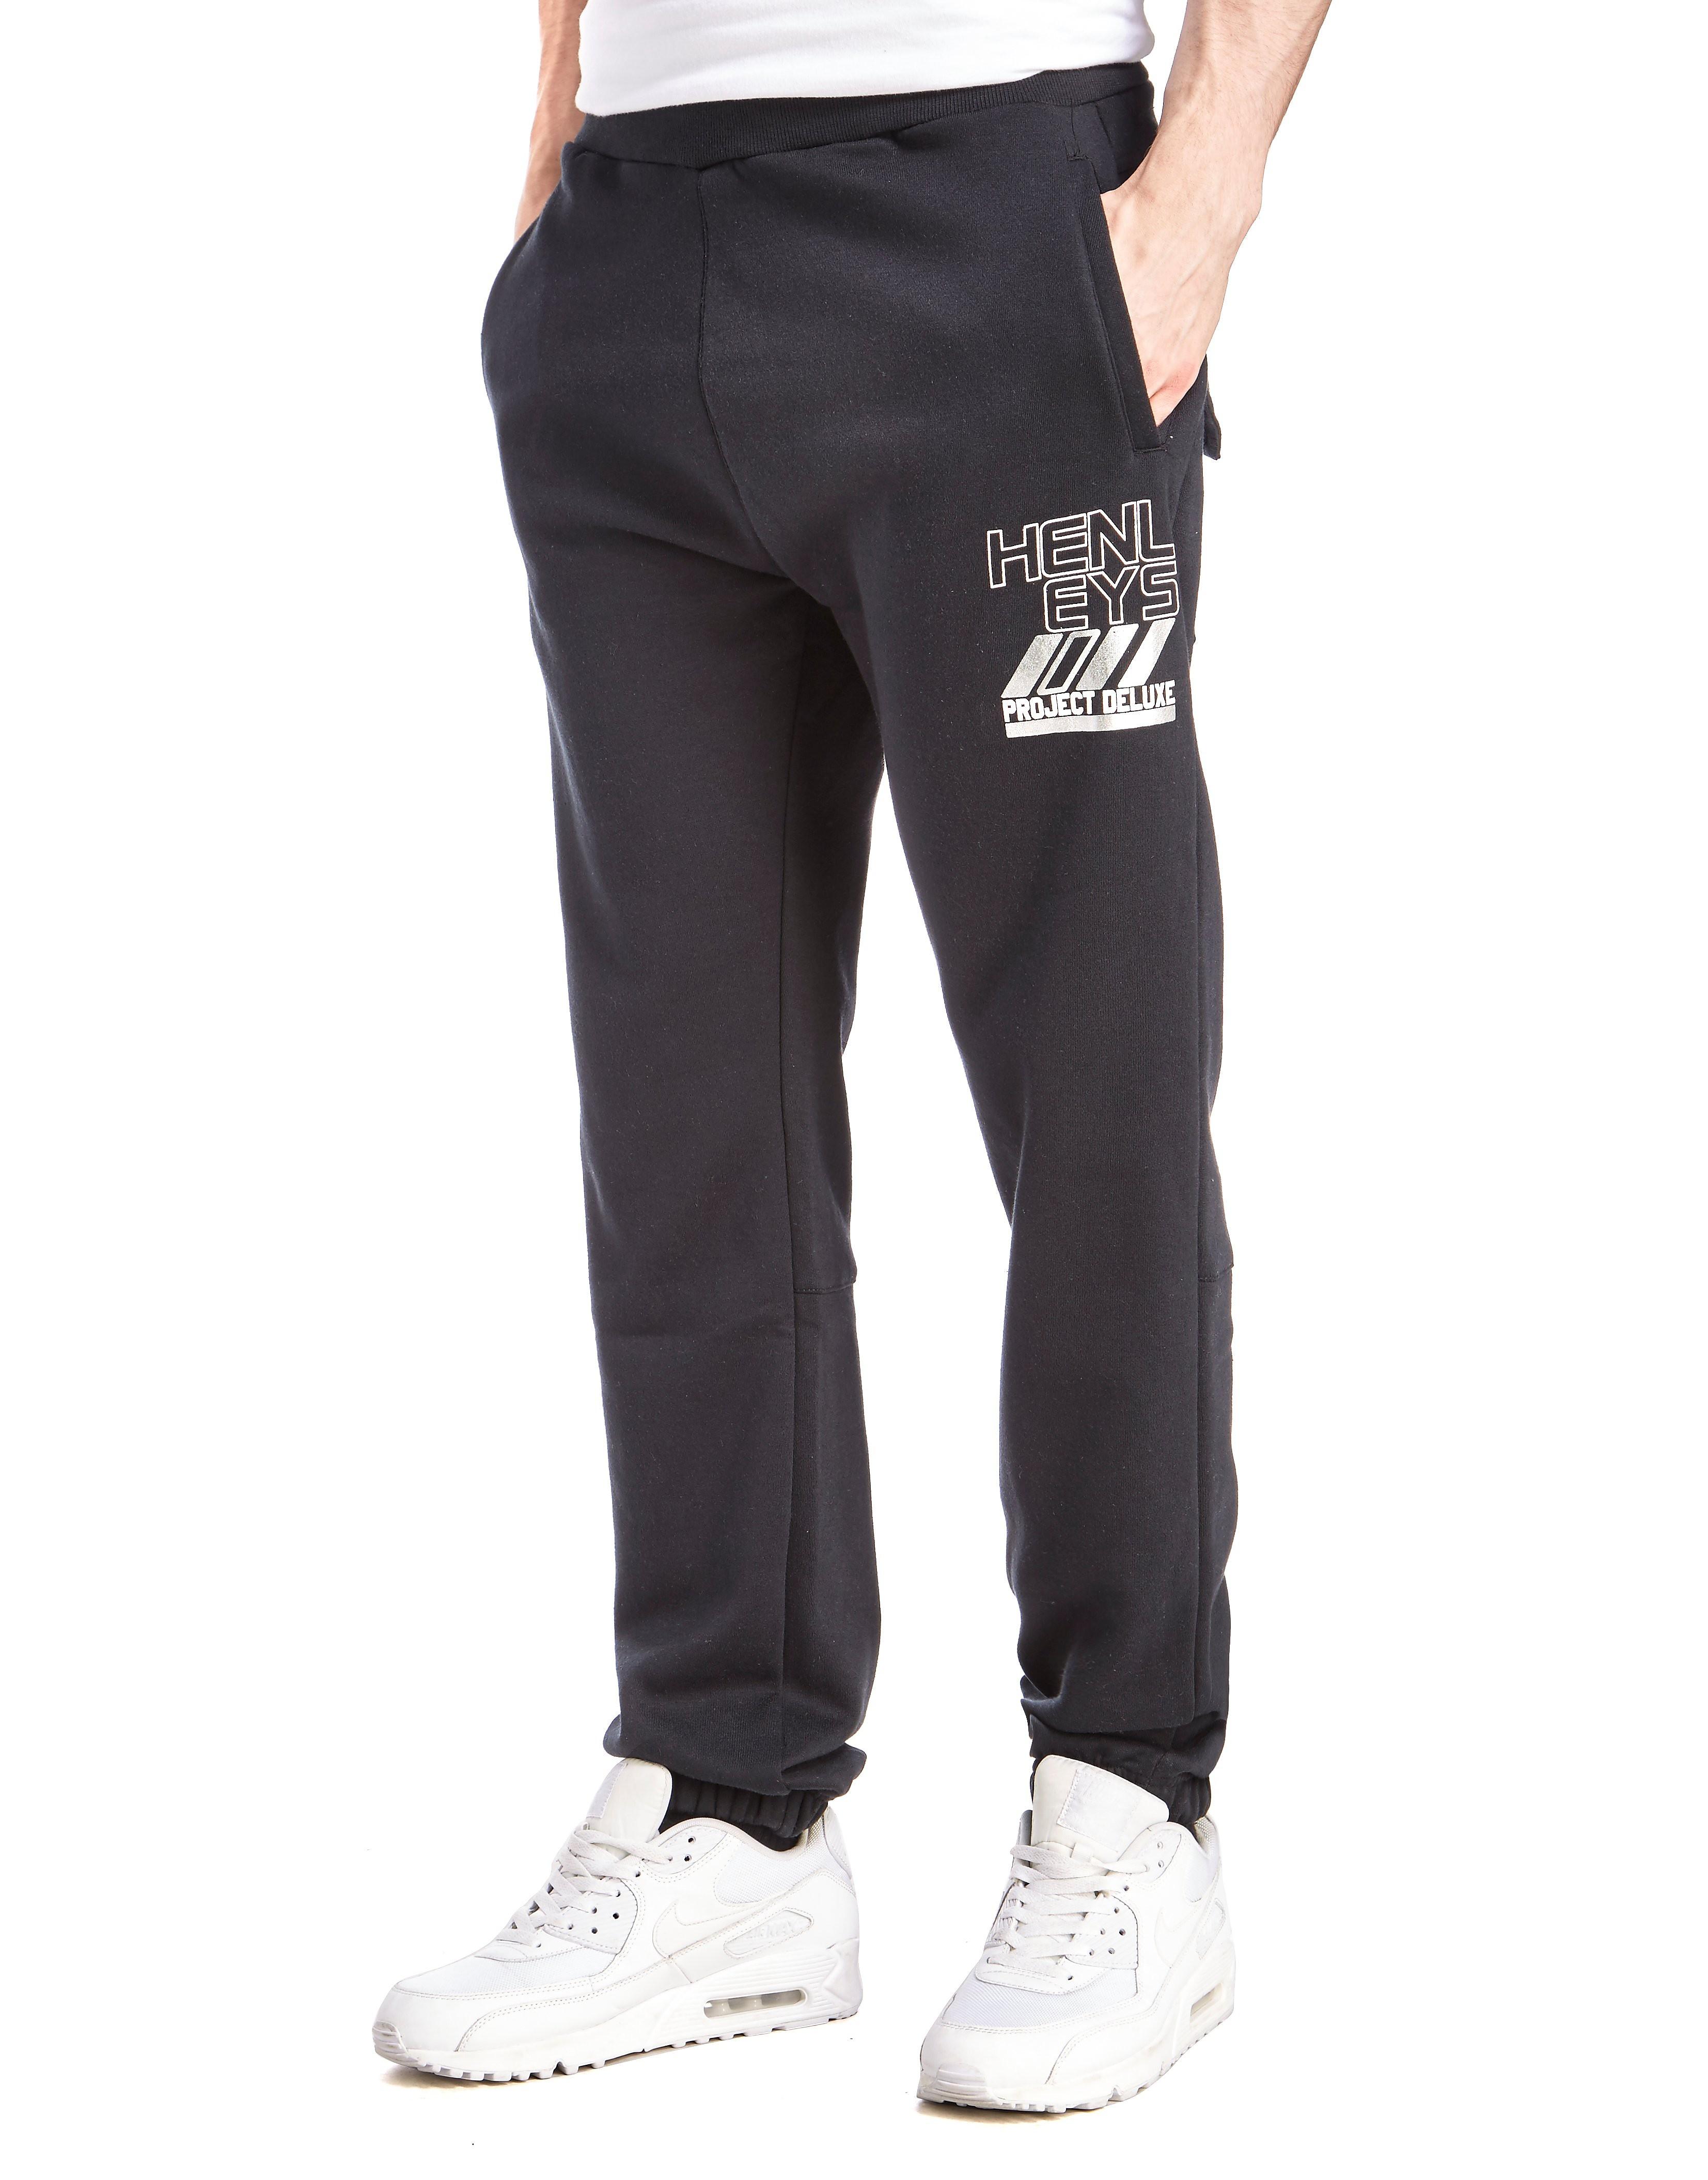 Henleys Calveron Track Pants